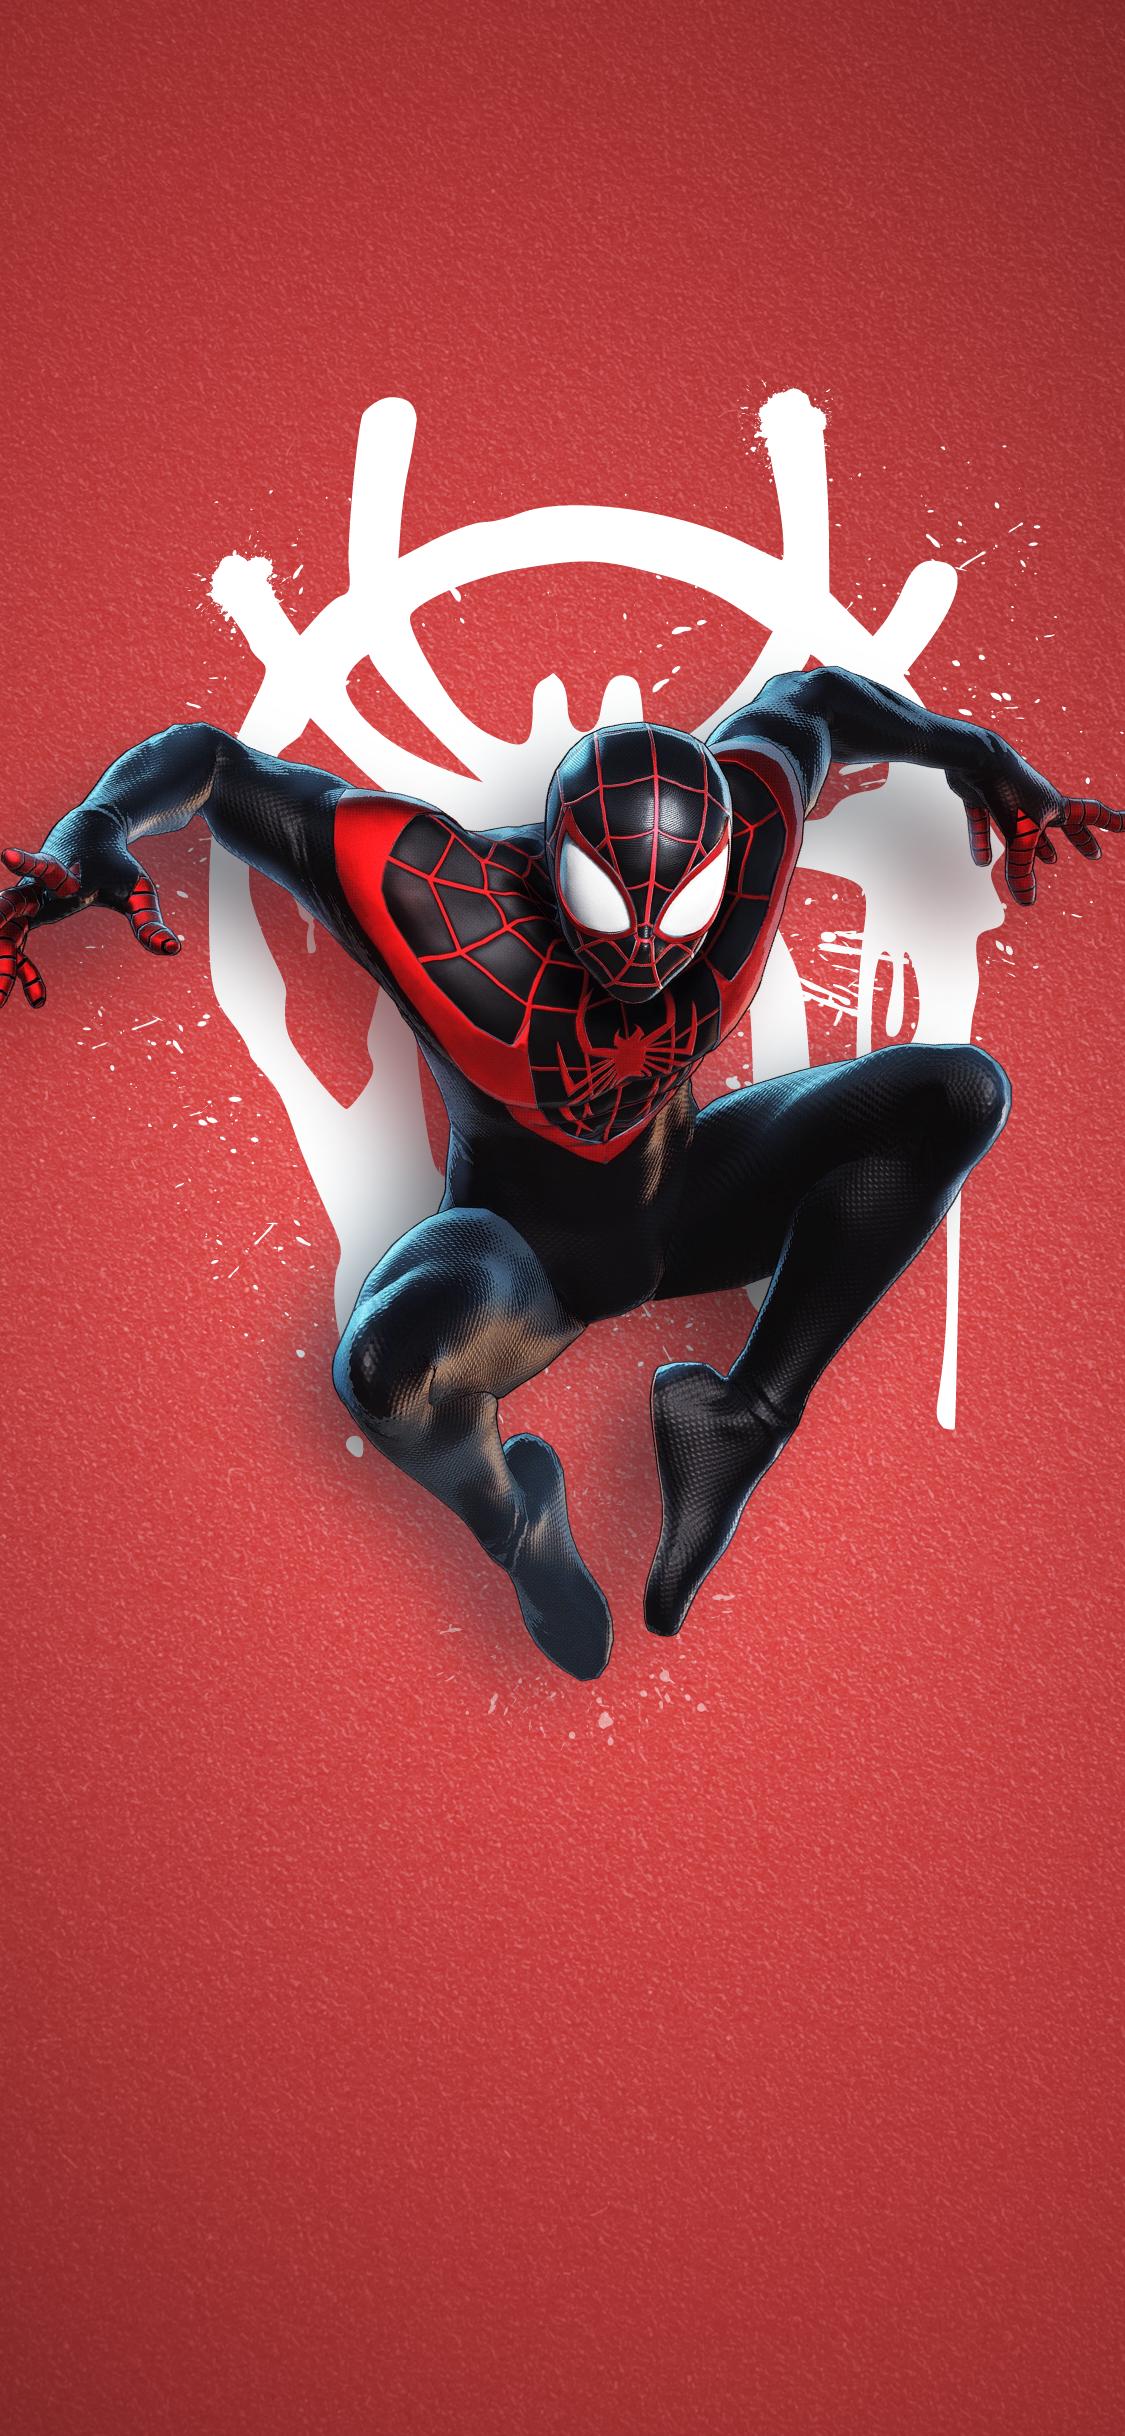 Playstation 5 Spiderman Miles Morales Marvel Spiderman Art Marvel Superhero Posters Miles Morales Spiderman